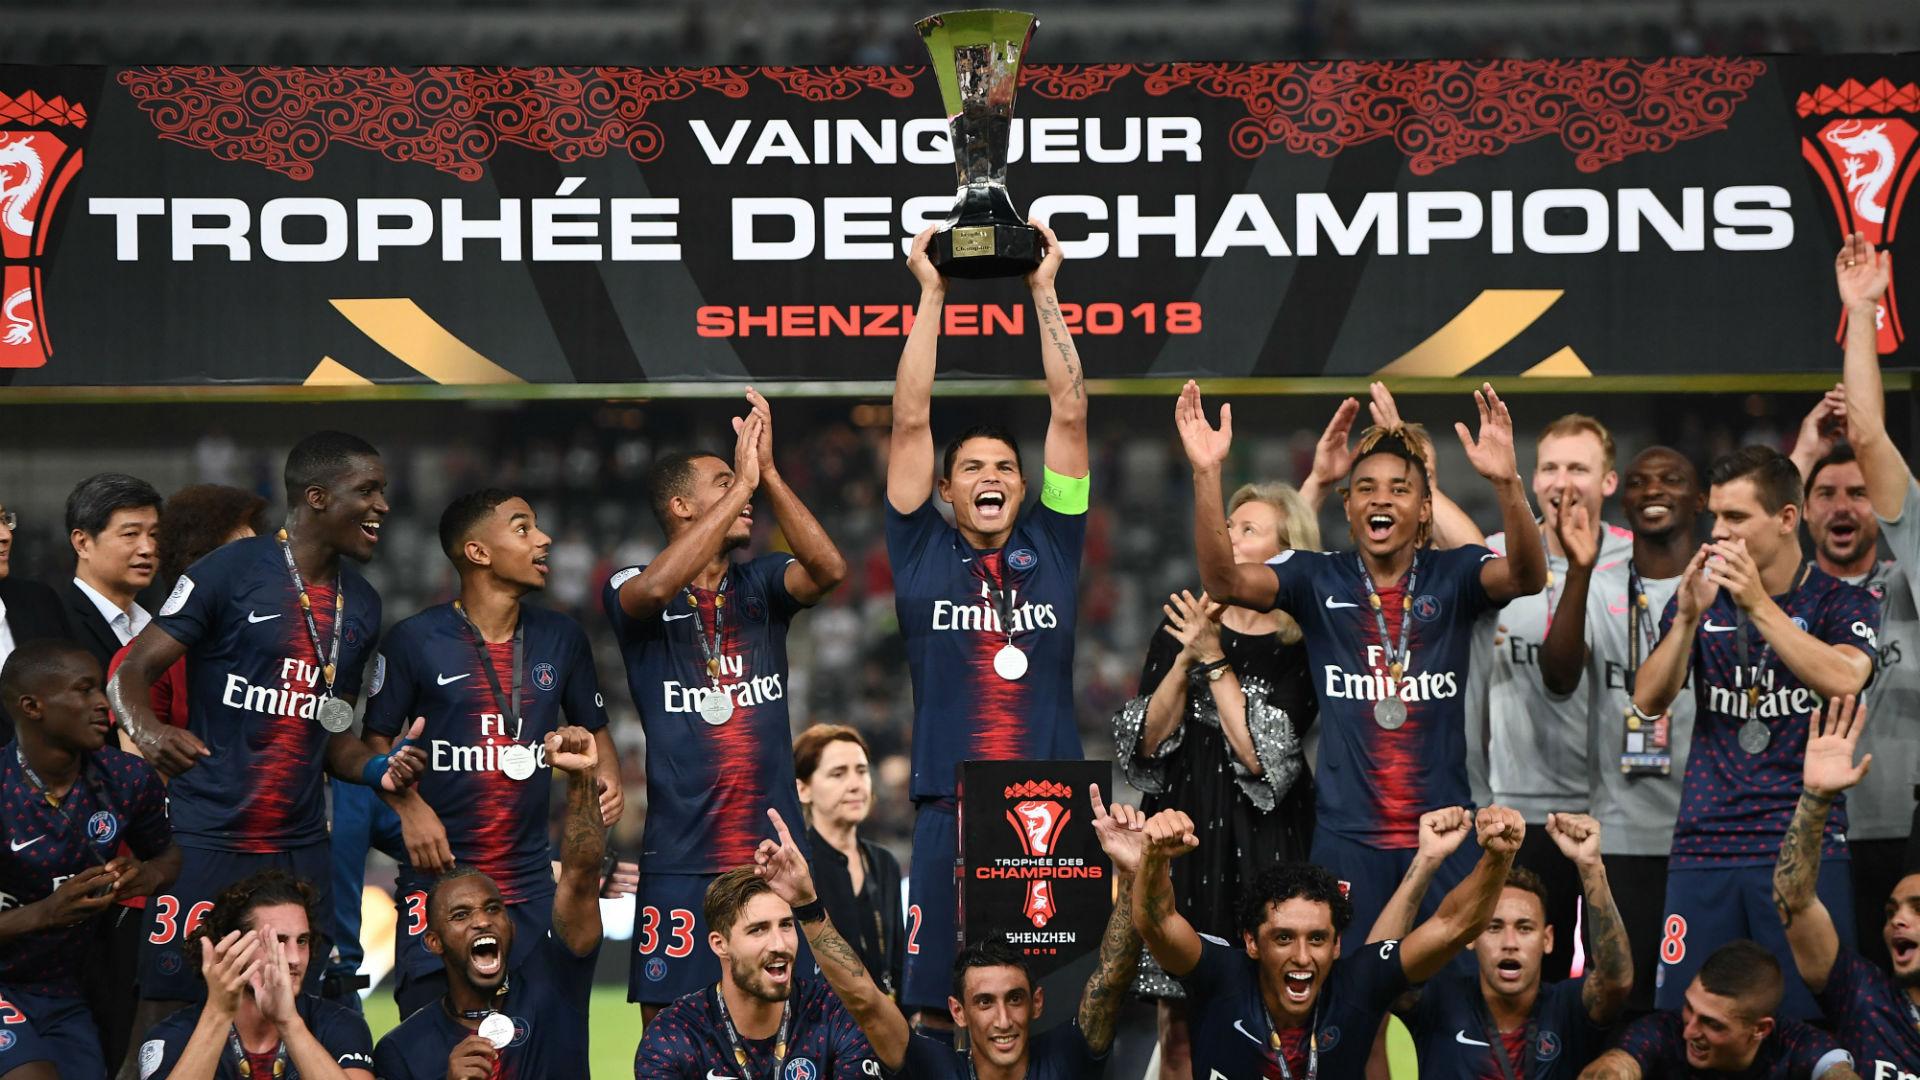 PSG dub themselves 'champion' of Instagram